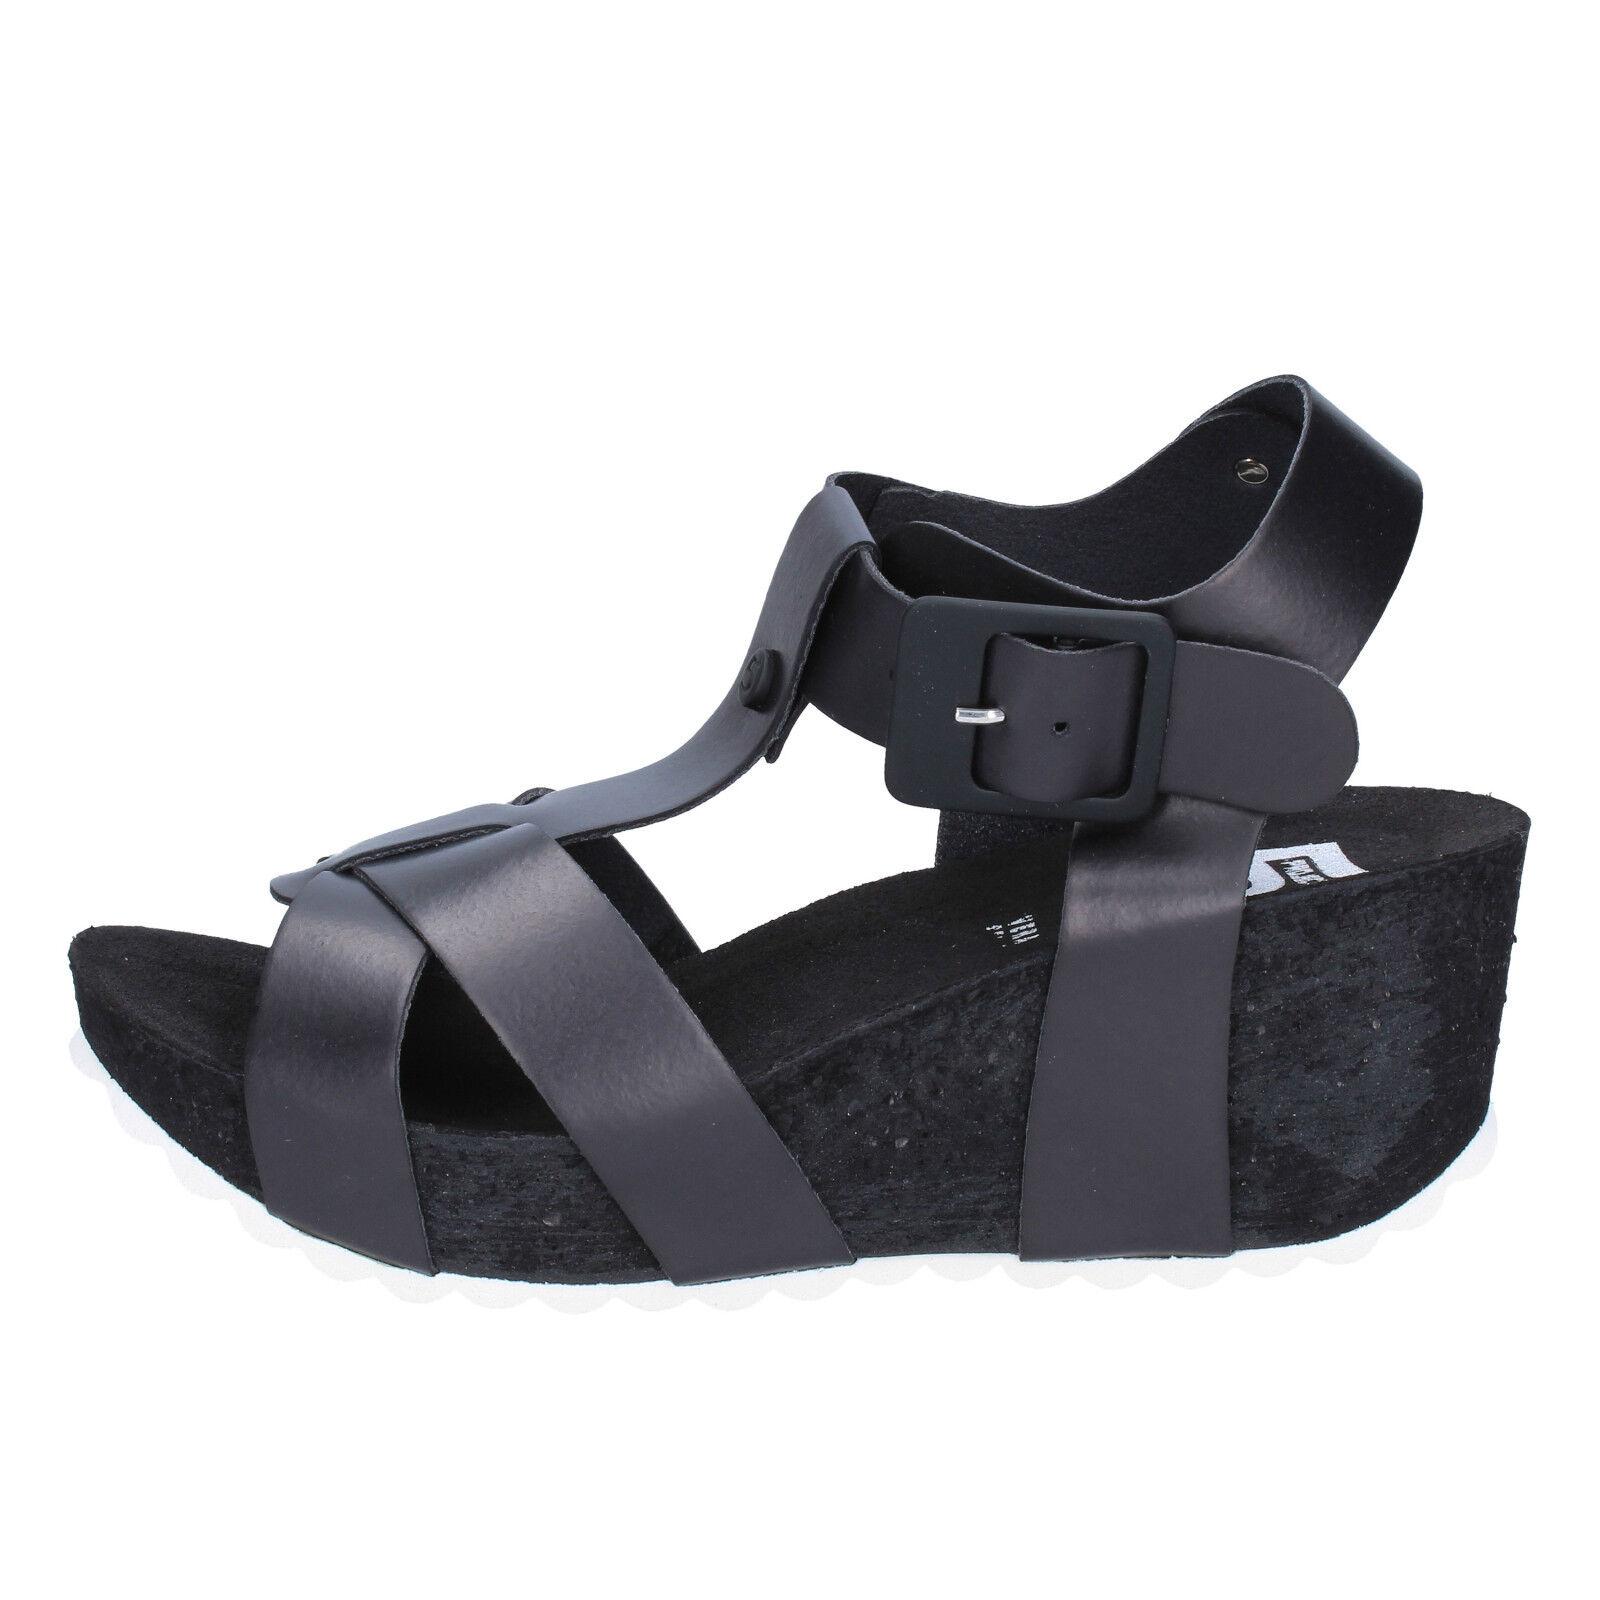 37 JECT PRO 5 schuhe Damen sandalen EU AC606 37 leder